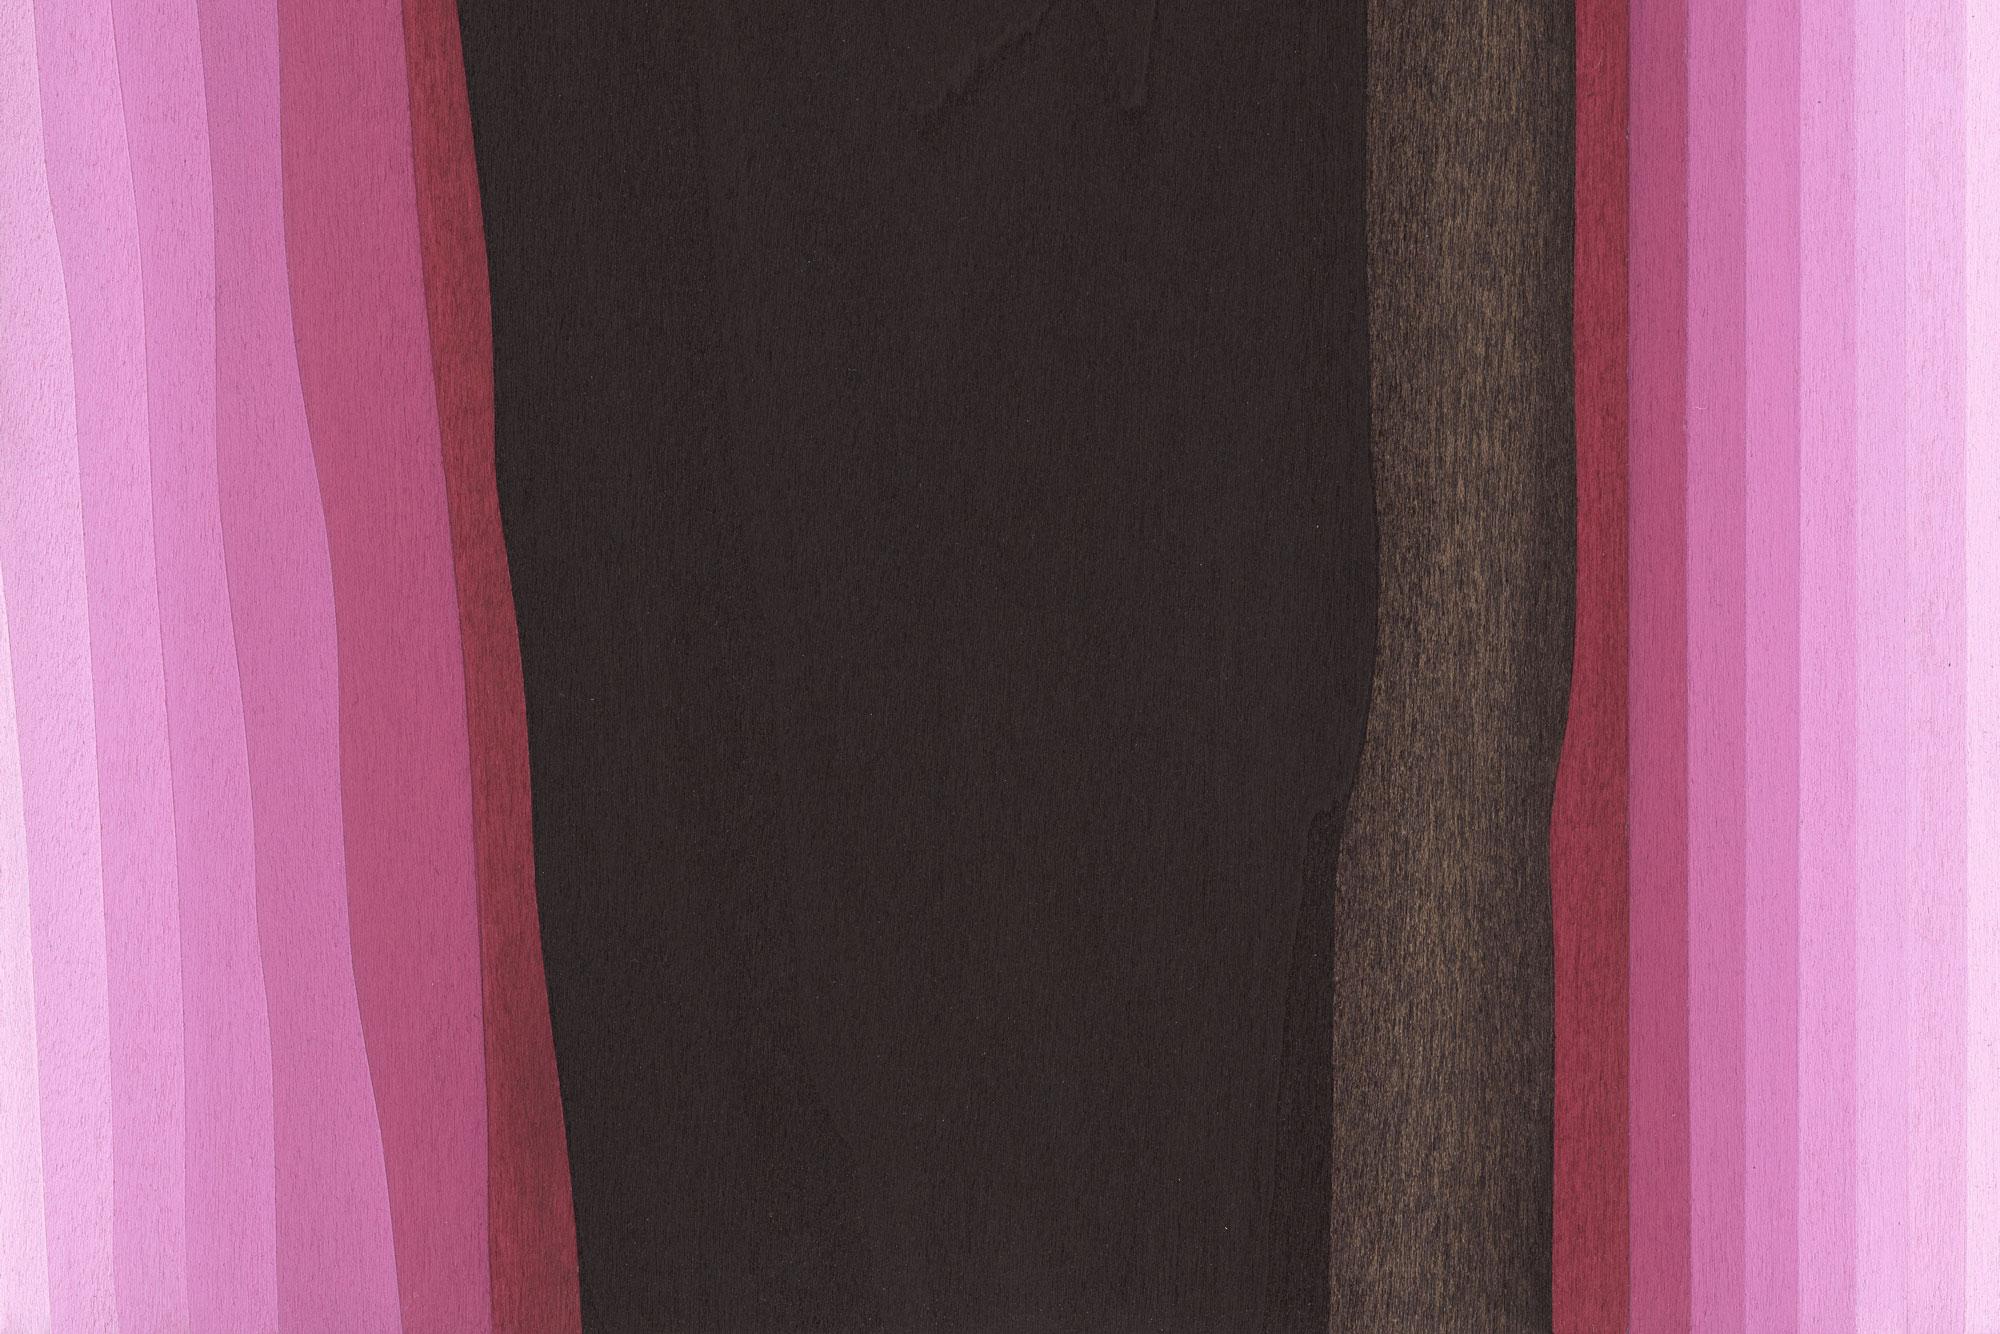 Photo: MCA Denver Georgia O'Keeffe Exhibit 3